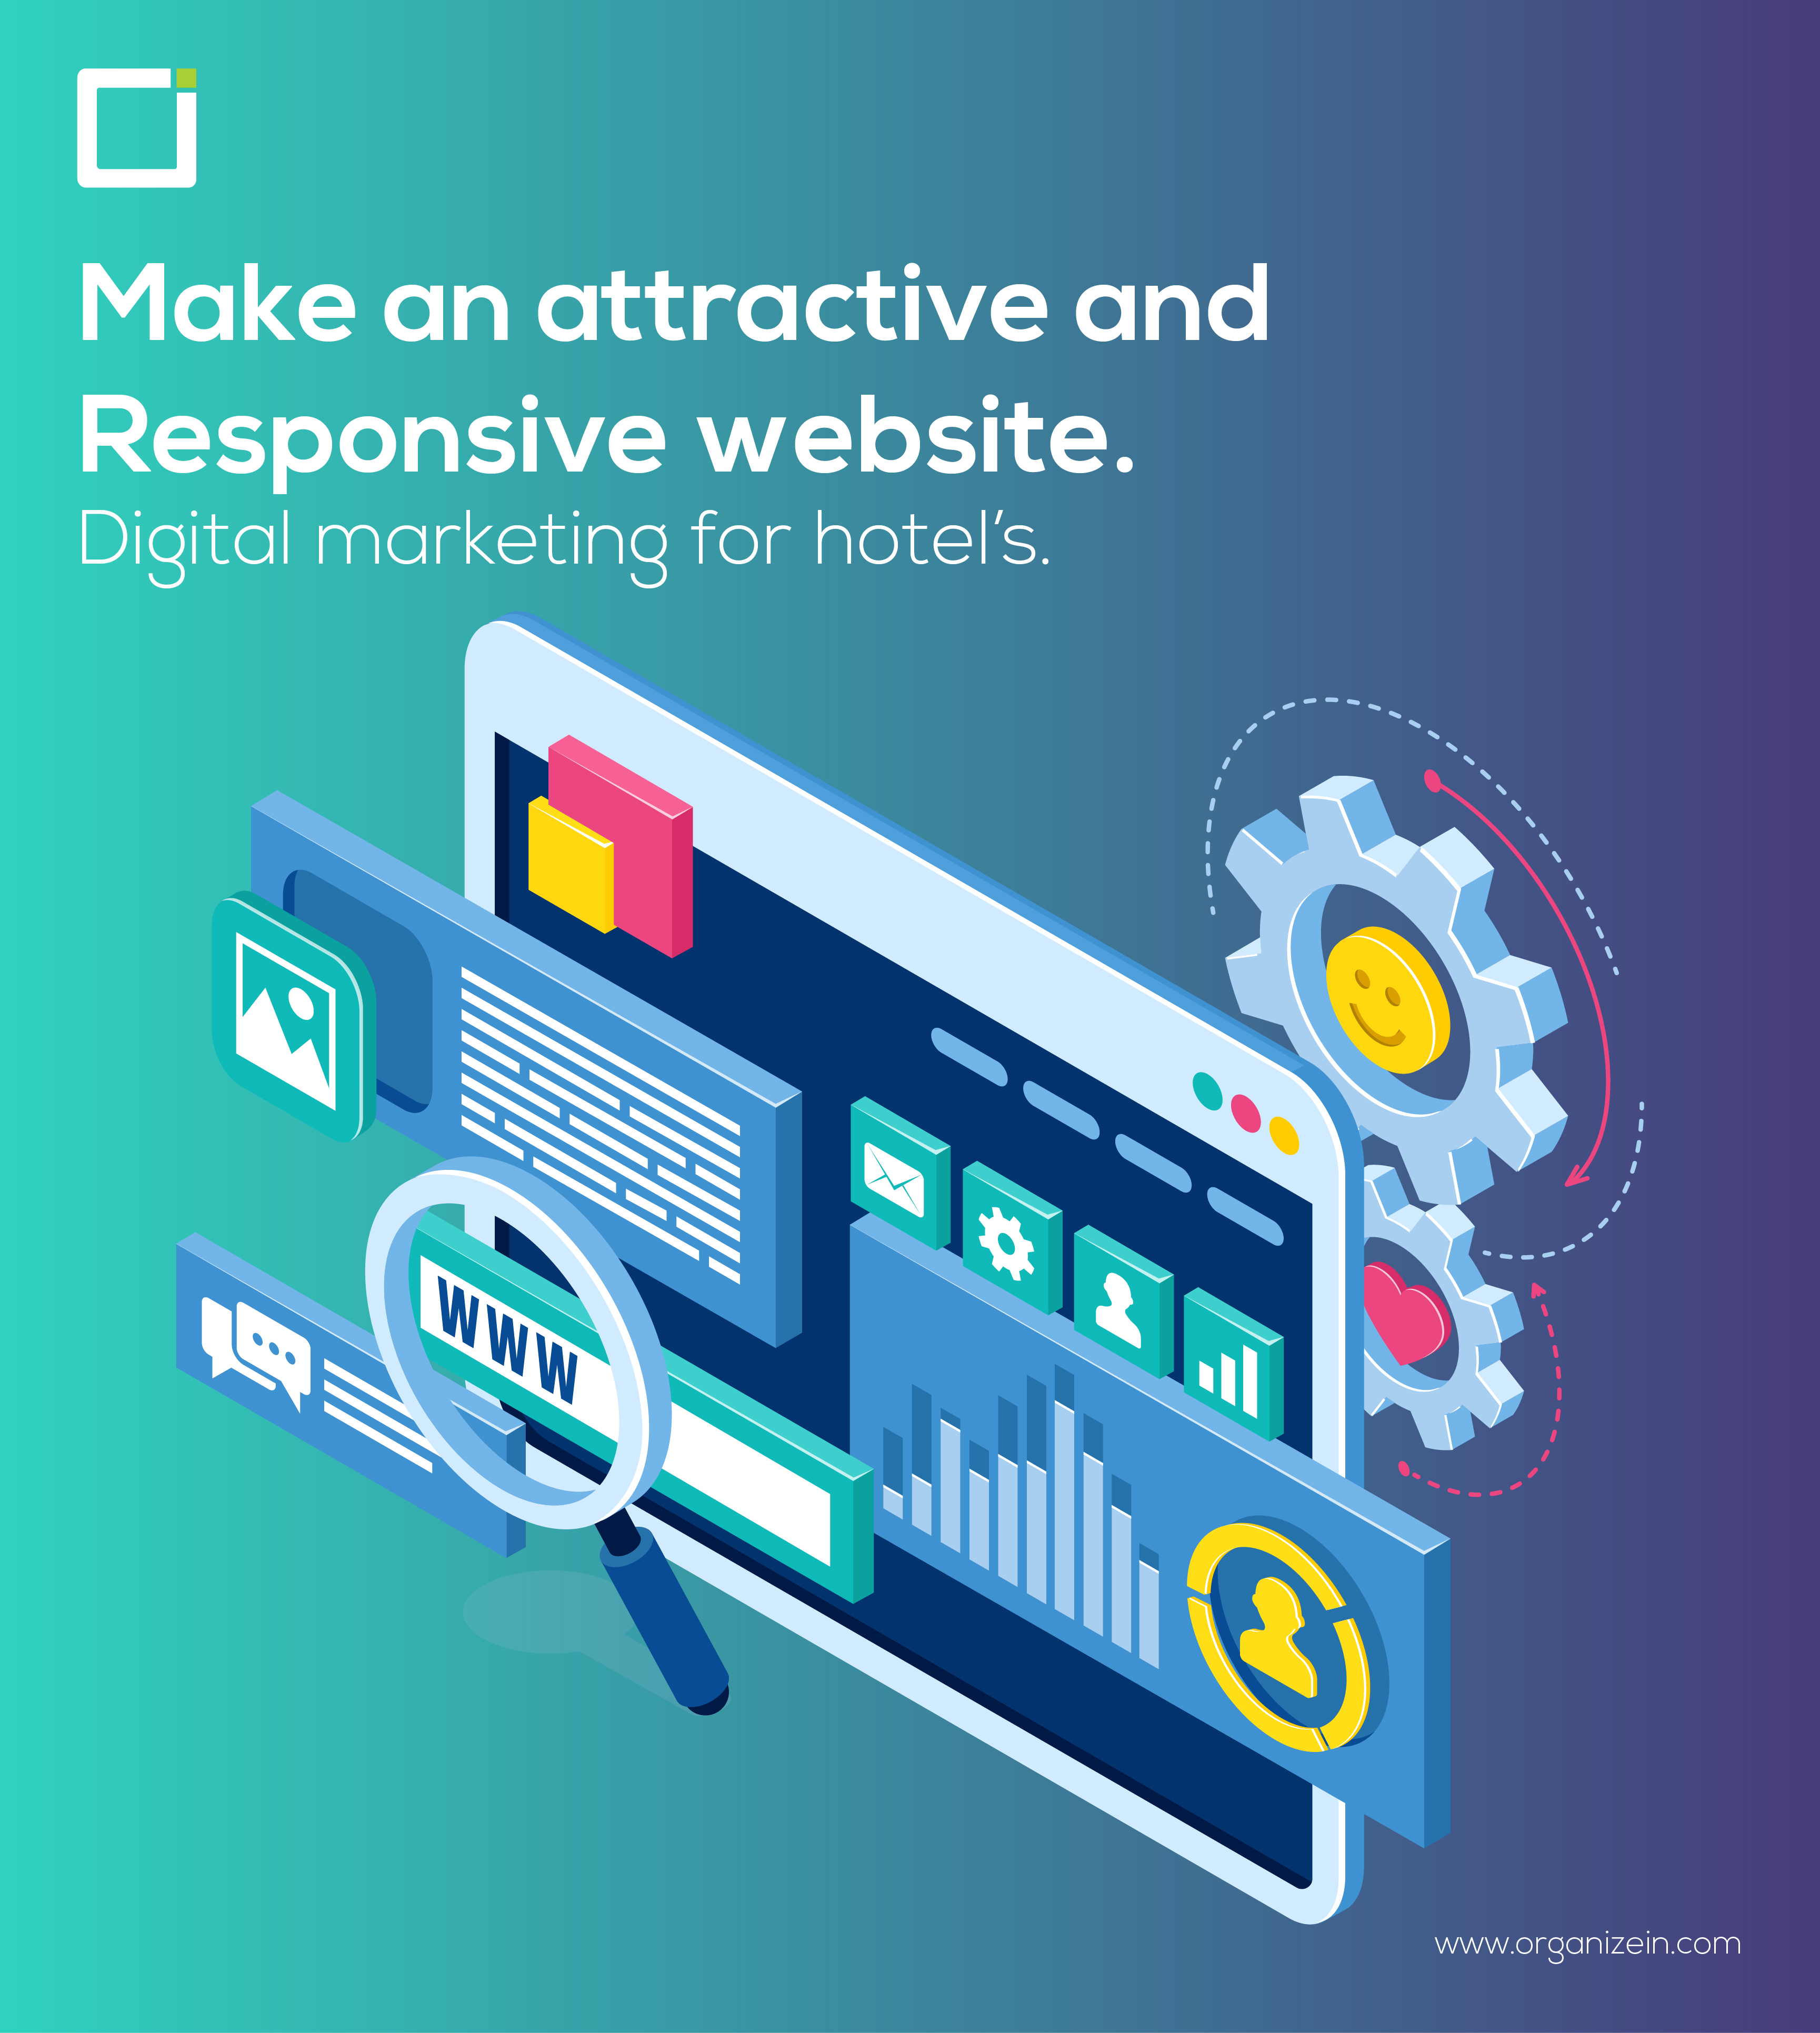 Digital marketing for hotels